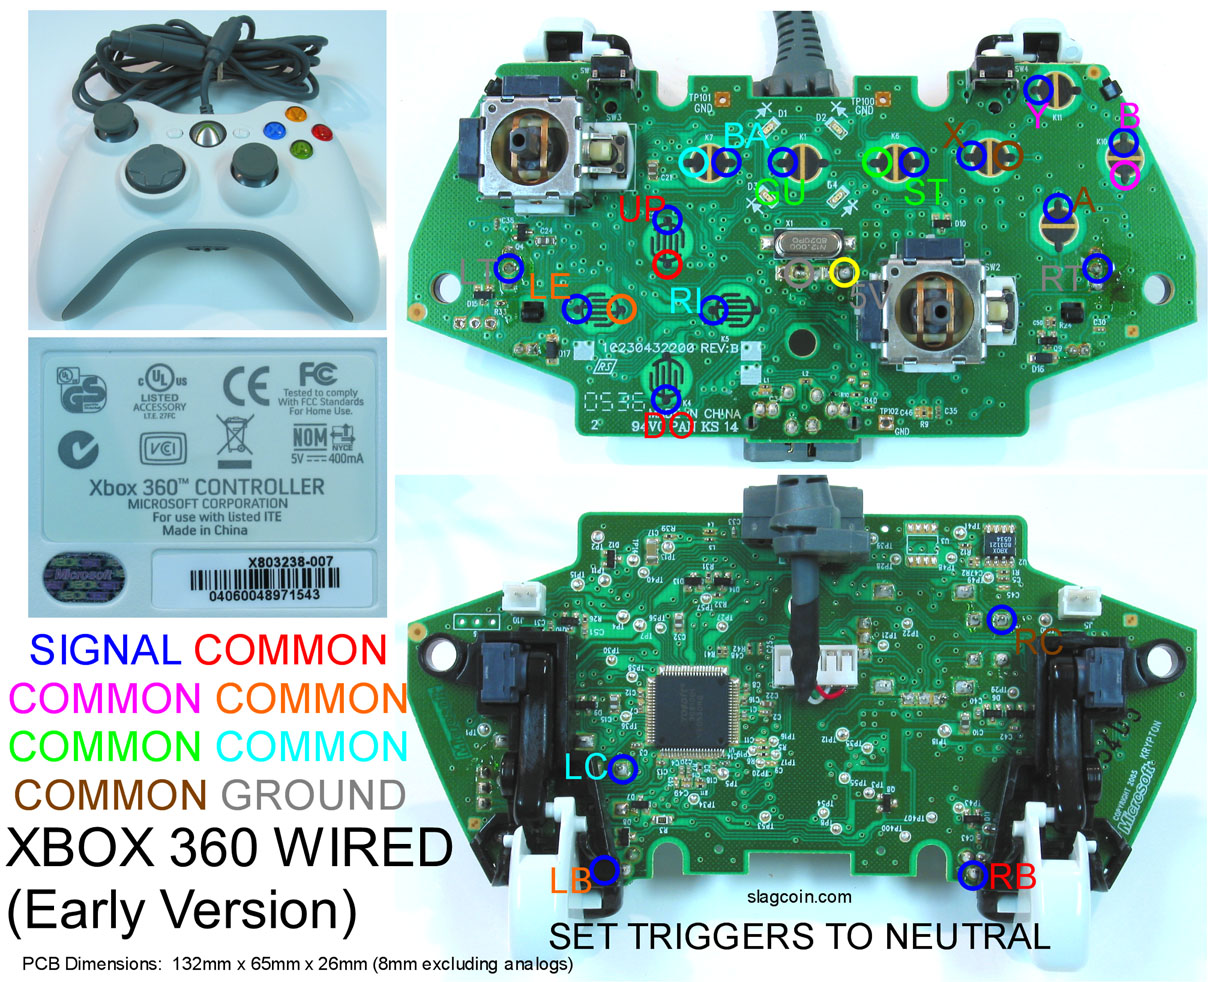 360 controller wiring diagrams ks 9901  wiring diagram moreover xbox 360 controller board diagram  wiring diagram moreover xbox 360